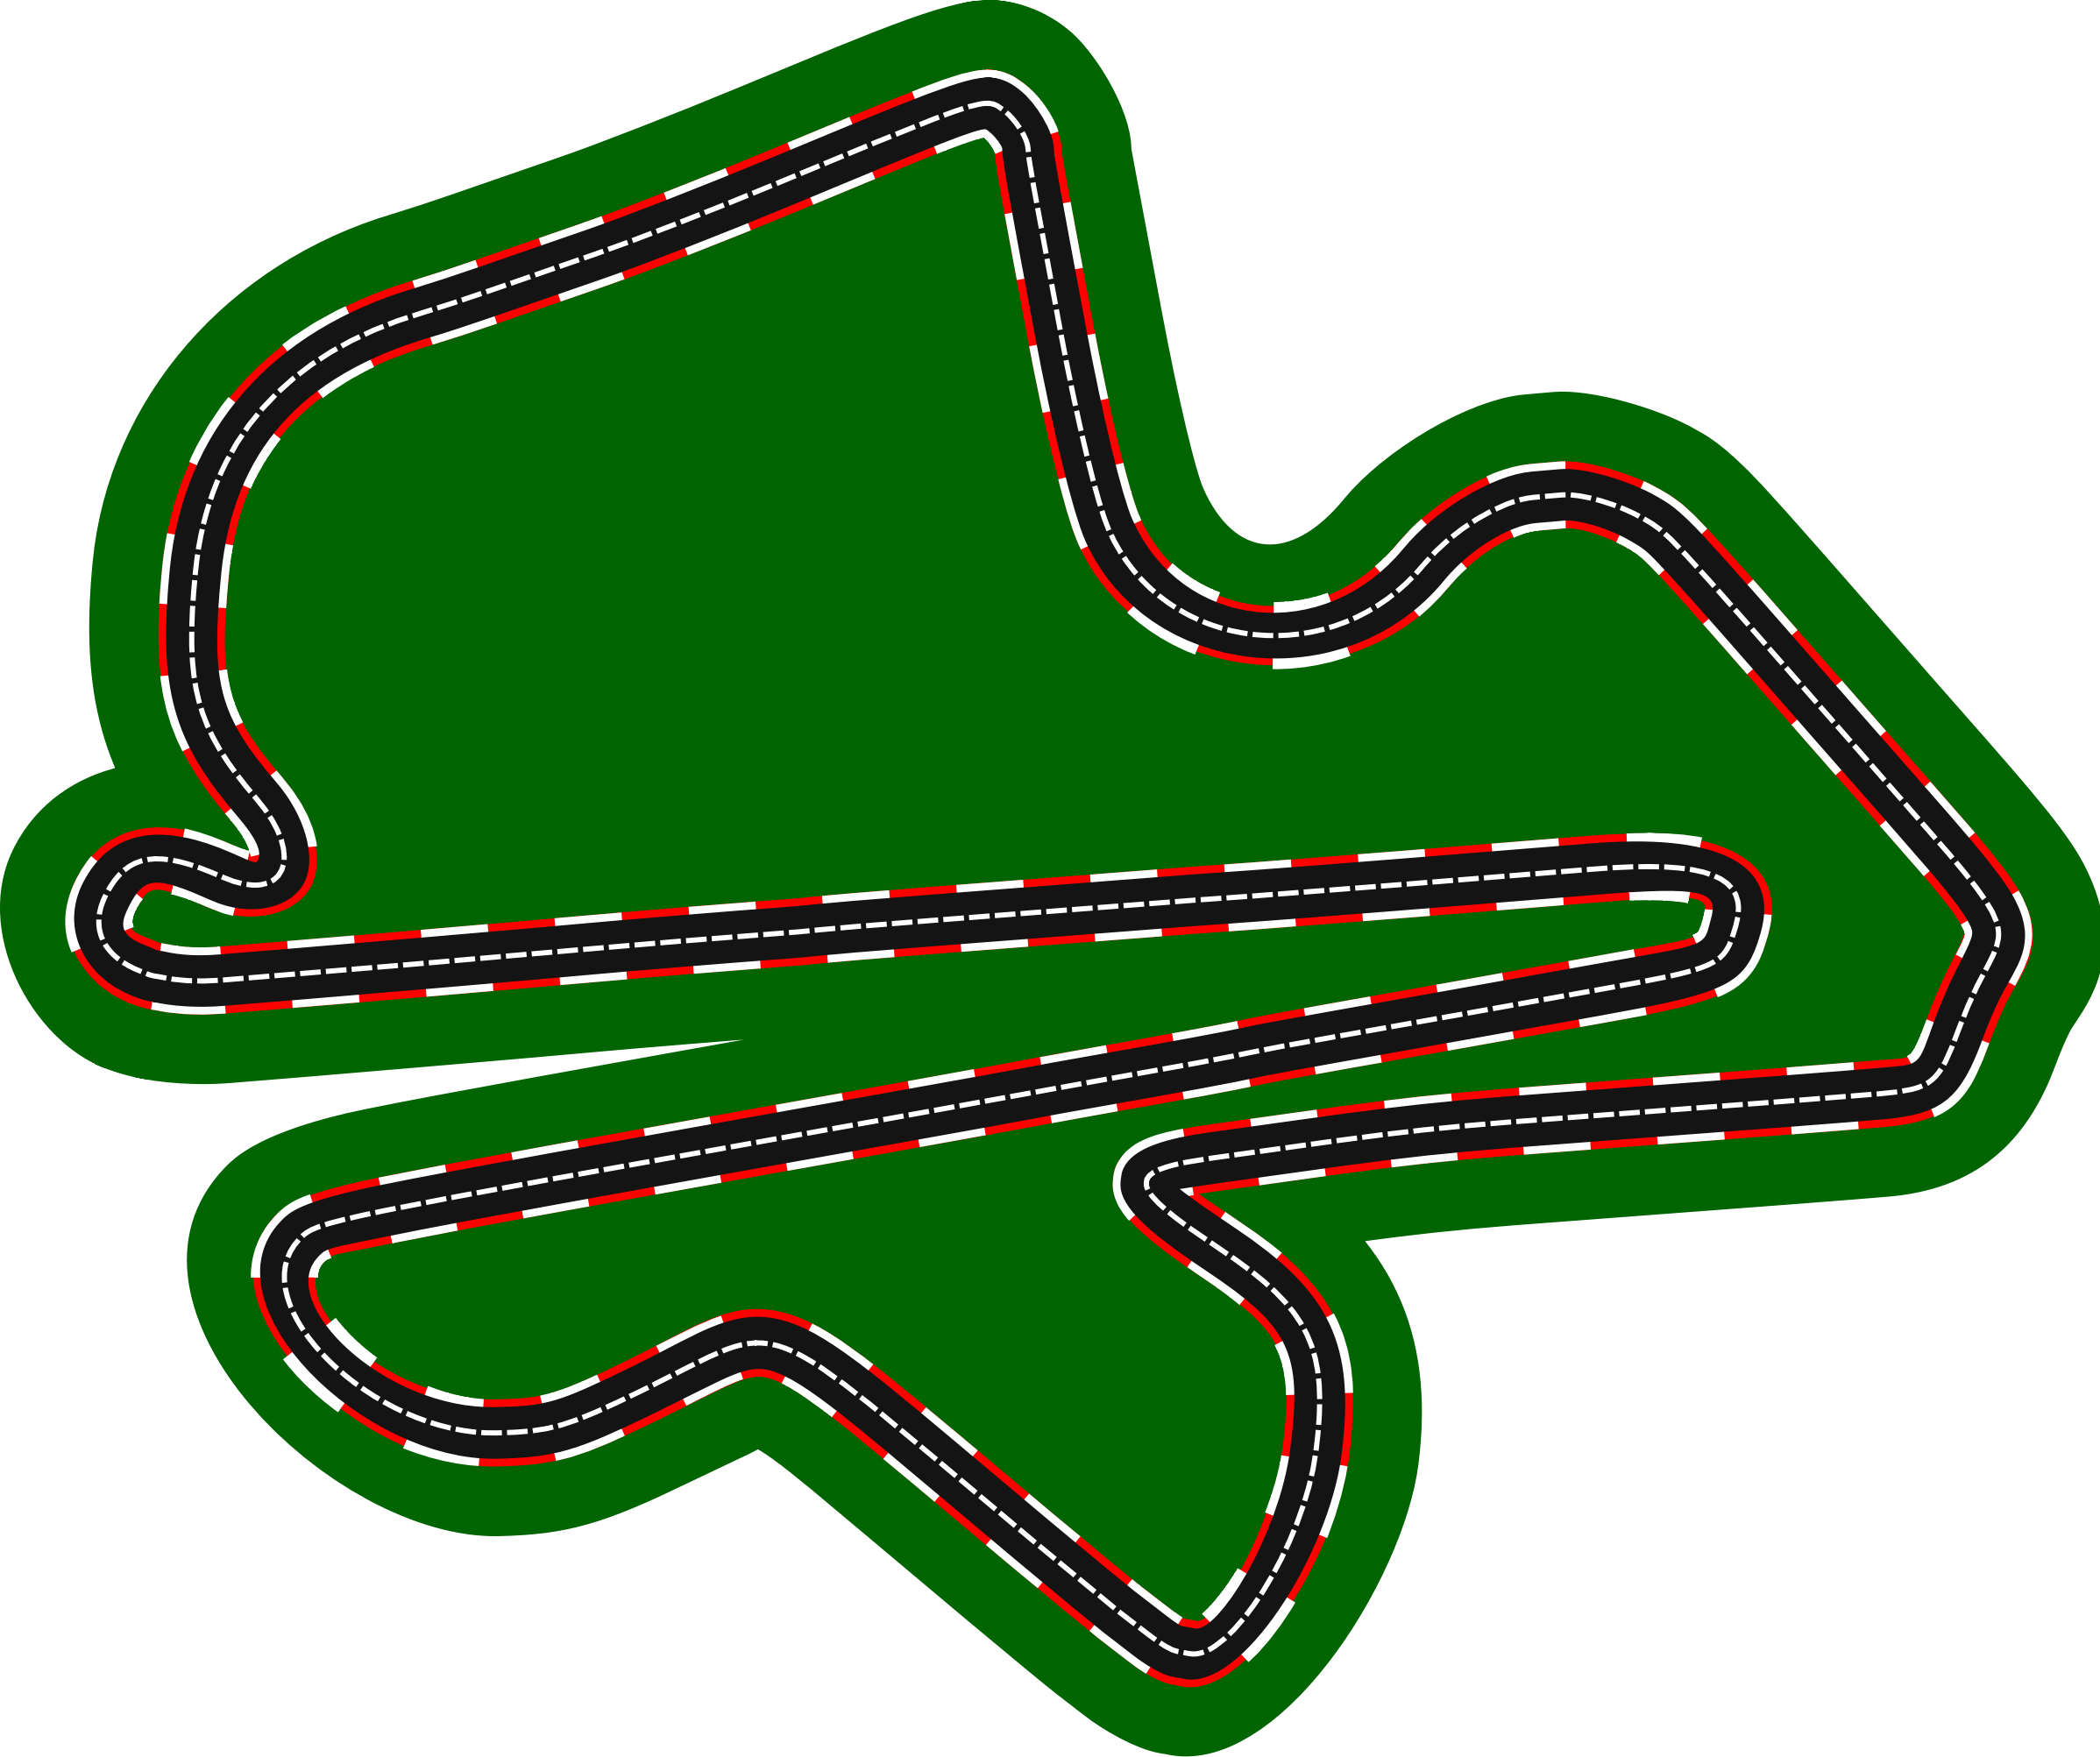 F circuits sepang international. Race clipart racecourse